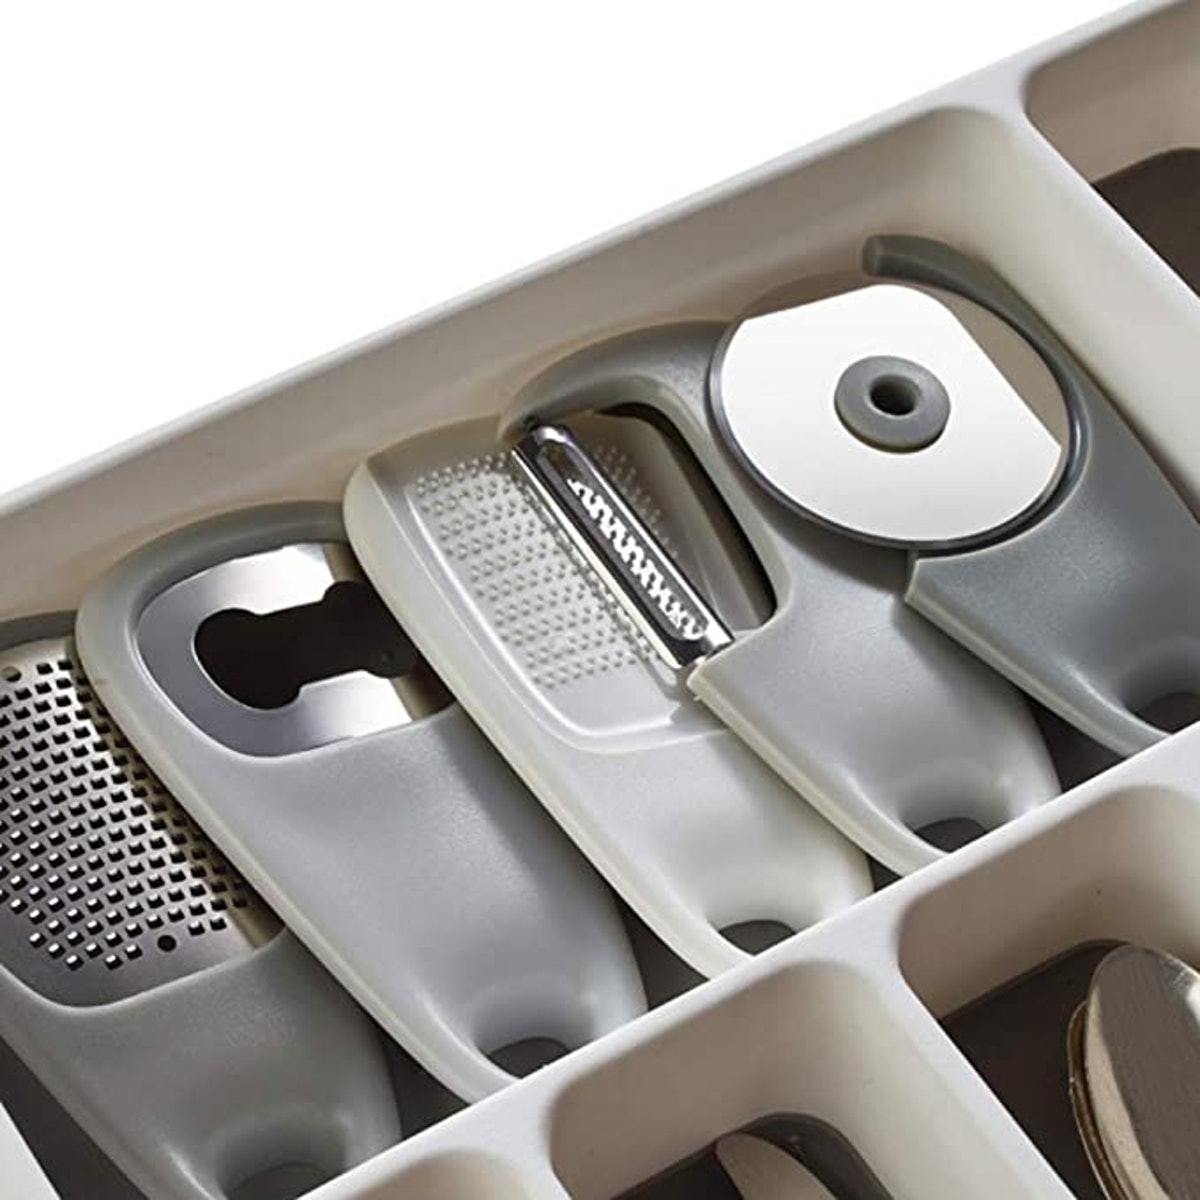 PortoFino 5-Piece Space Saving Cooking Tools